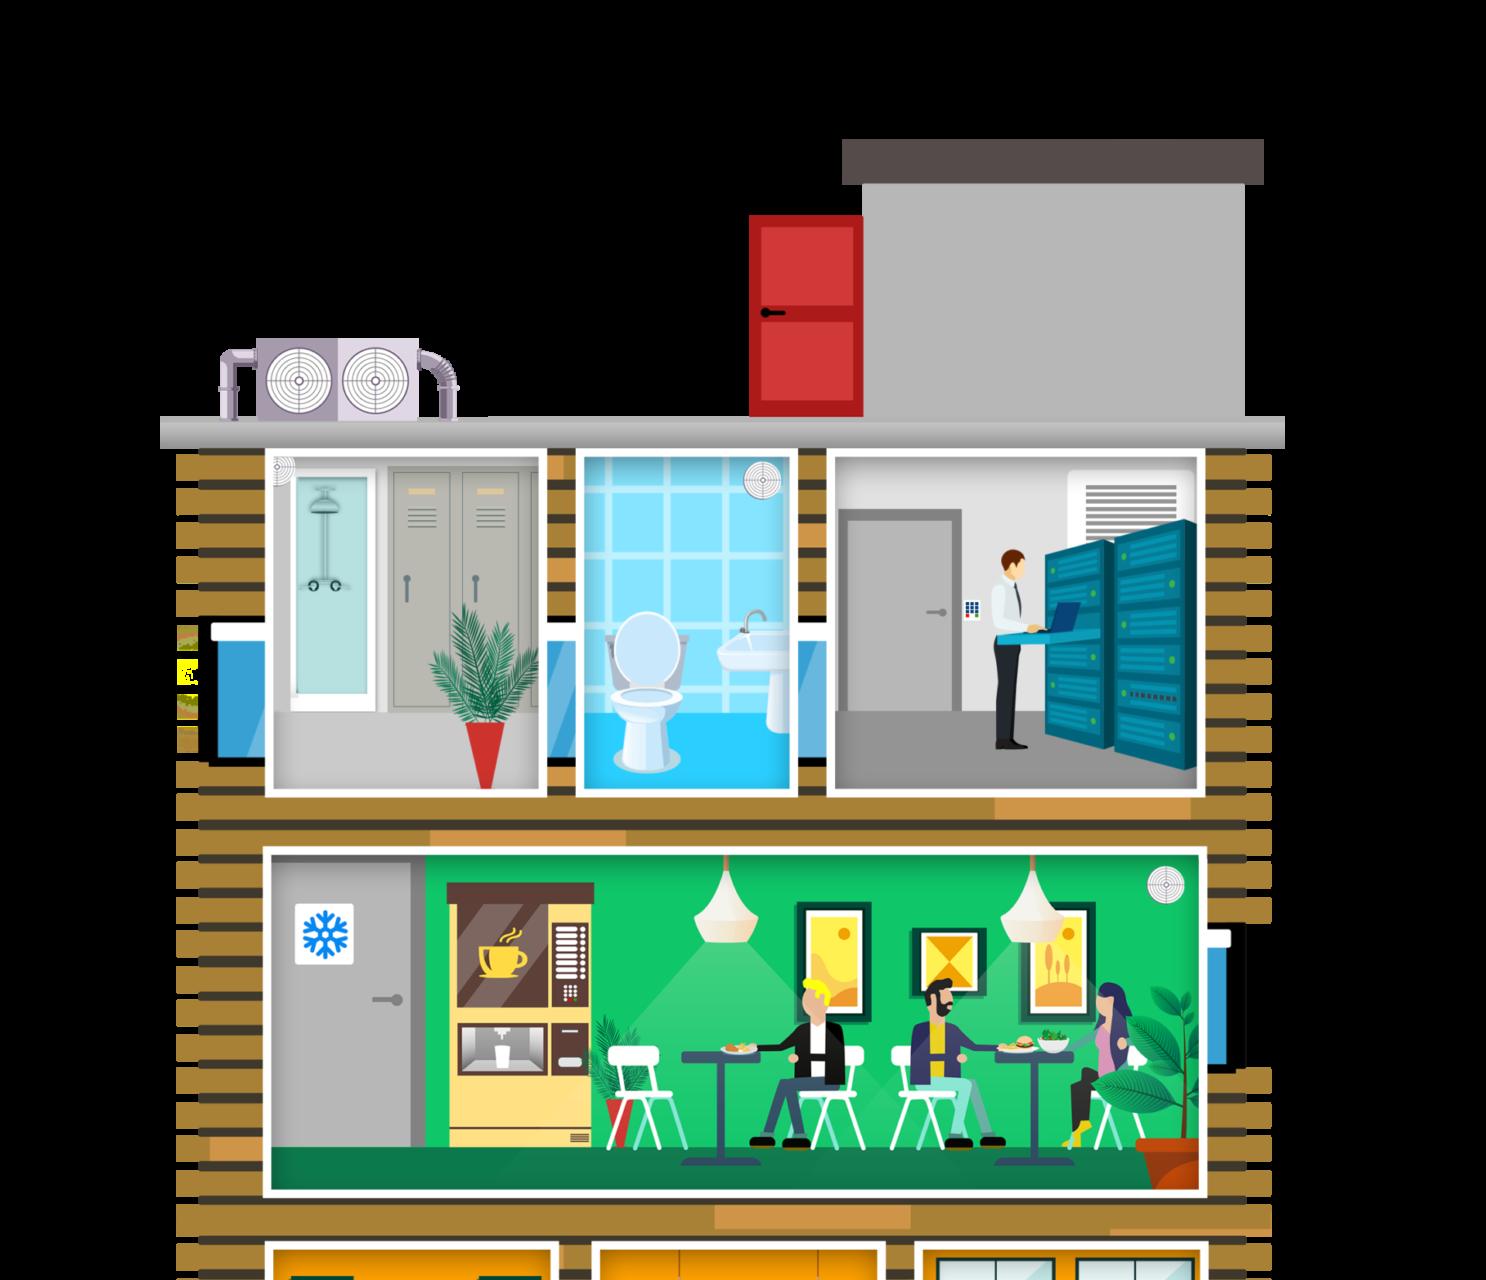 iot-smart-building-ventilation